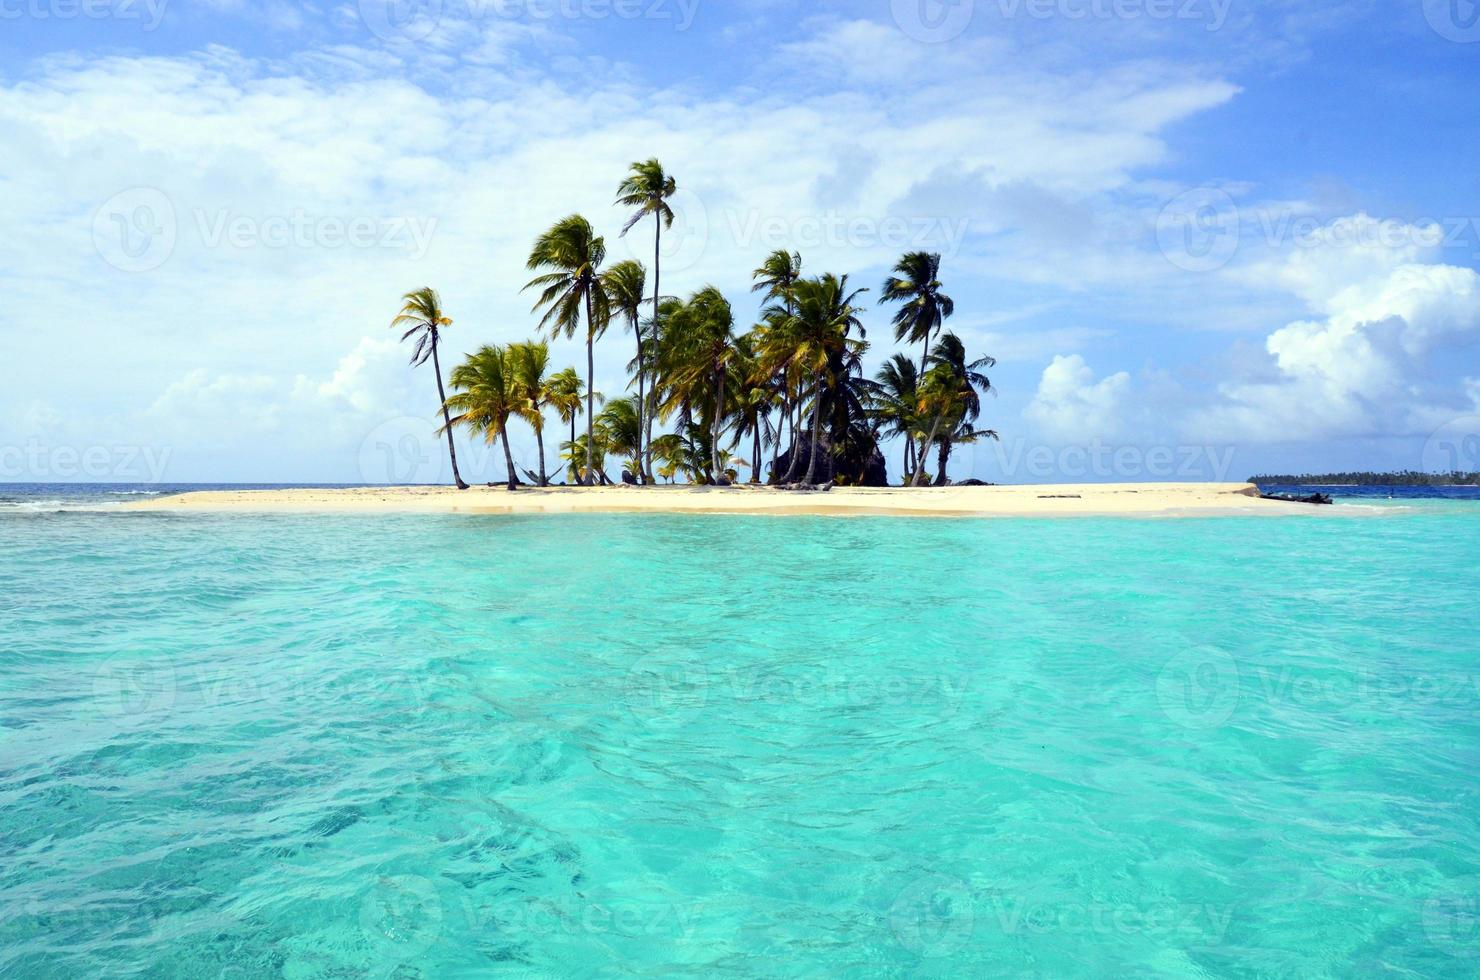 kuna yala - san blas island foto